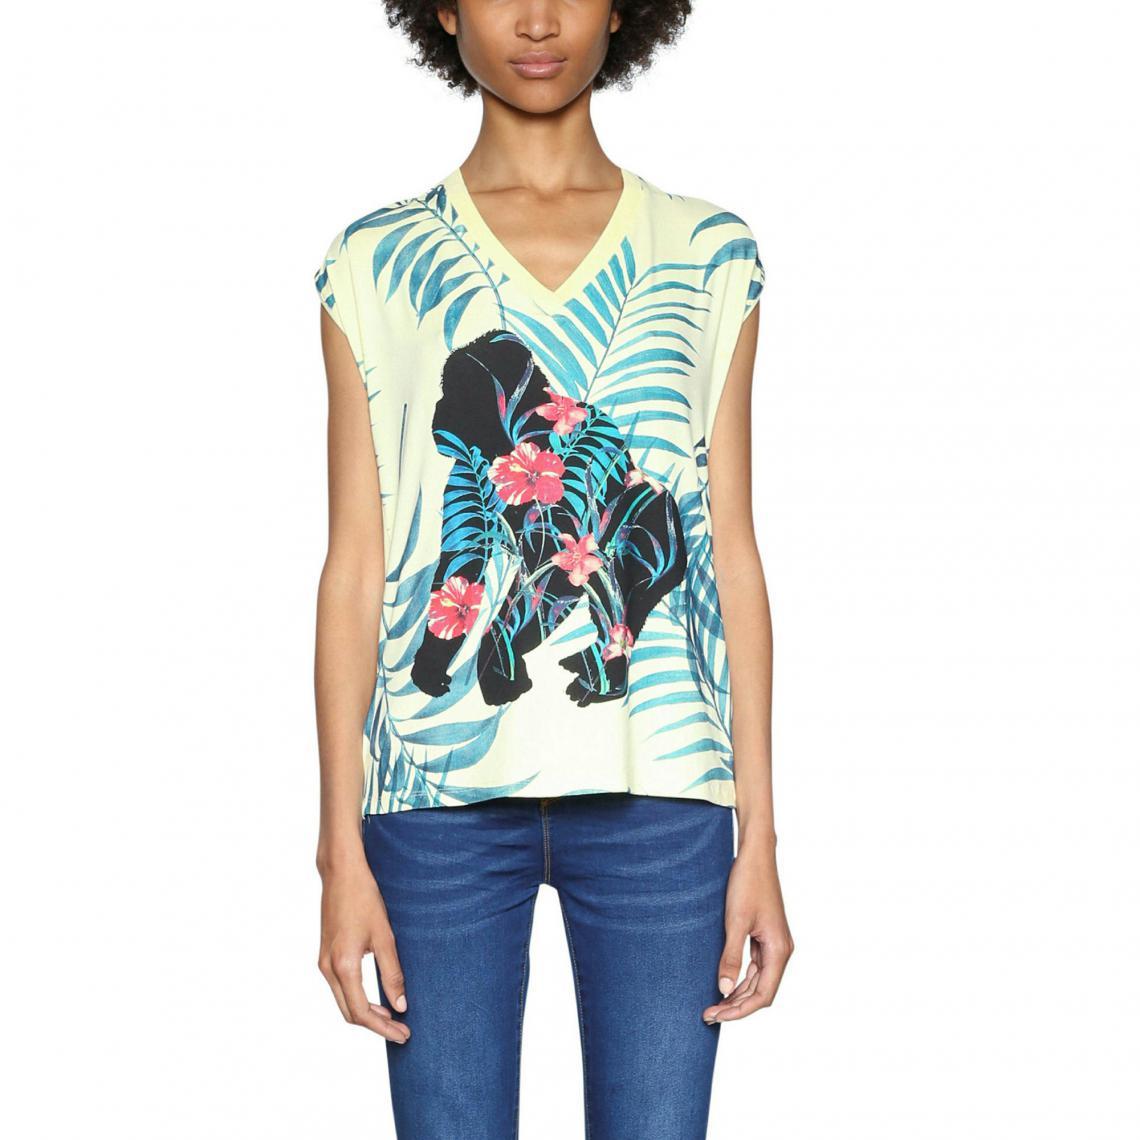 Tee-shirt manches courtes femme Desigual